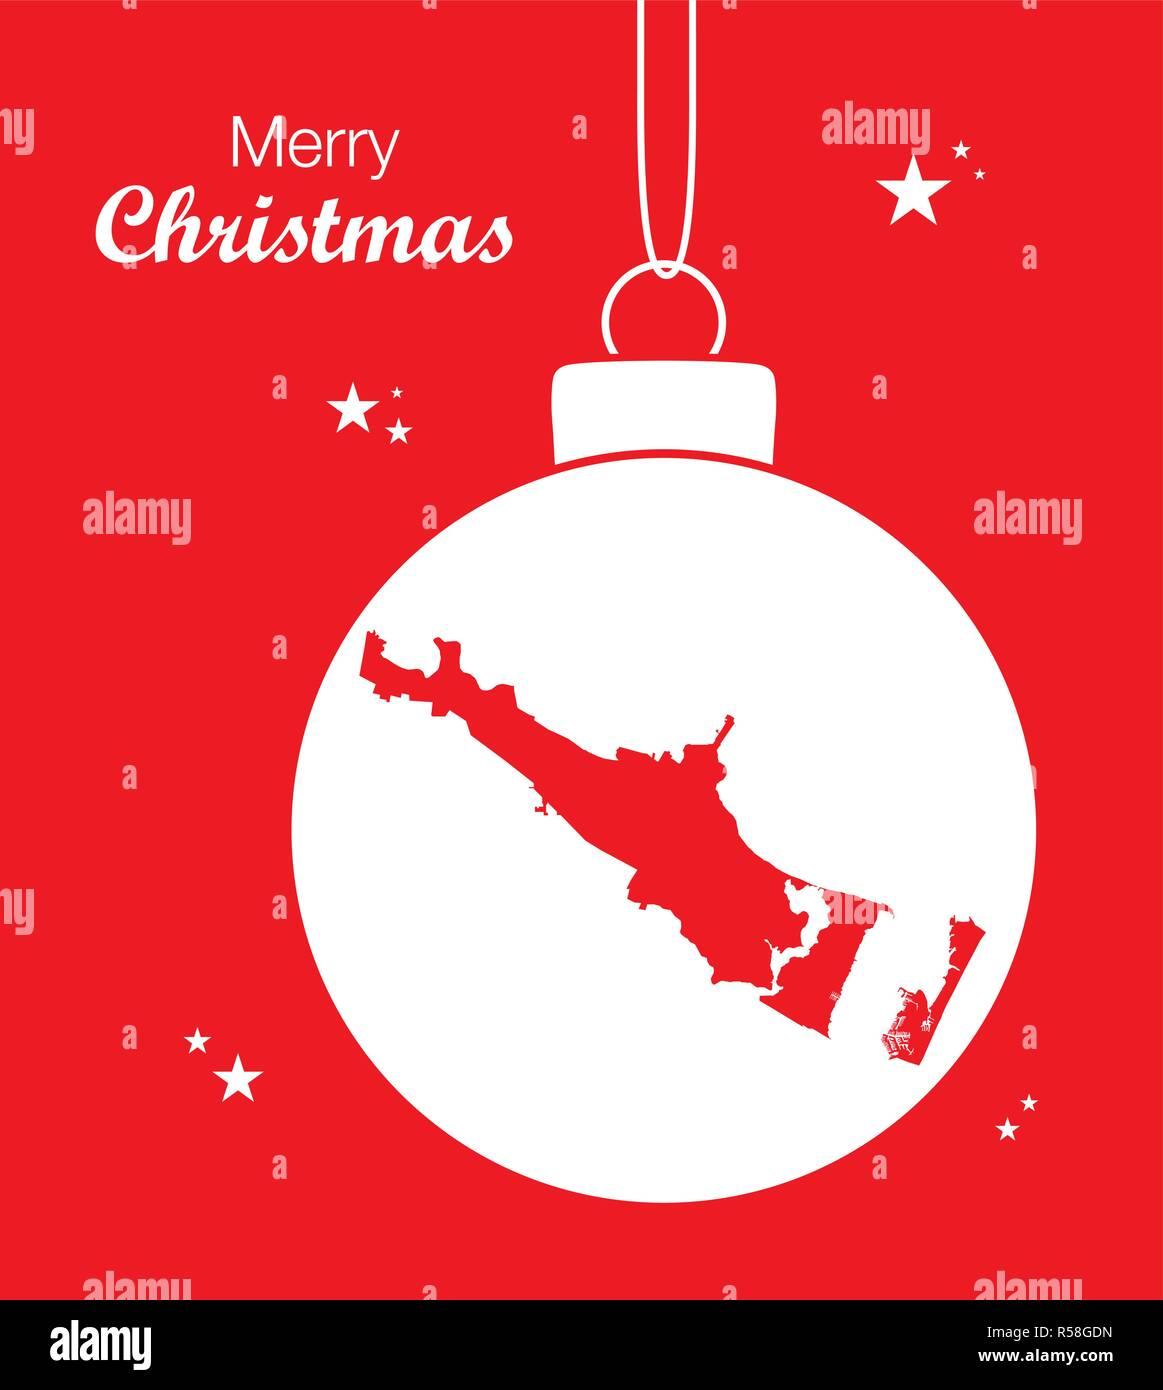 Merry Christmas illustration theme with map of Corpus Christi Texas - Stock Vector